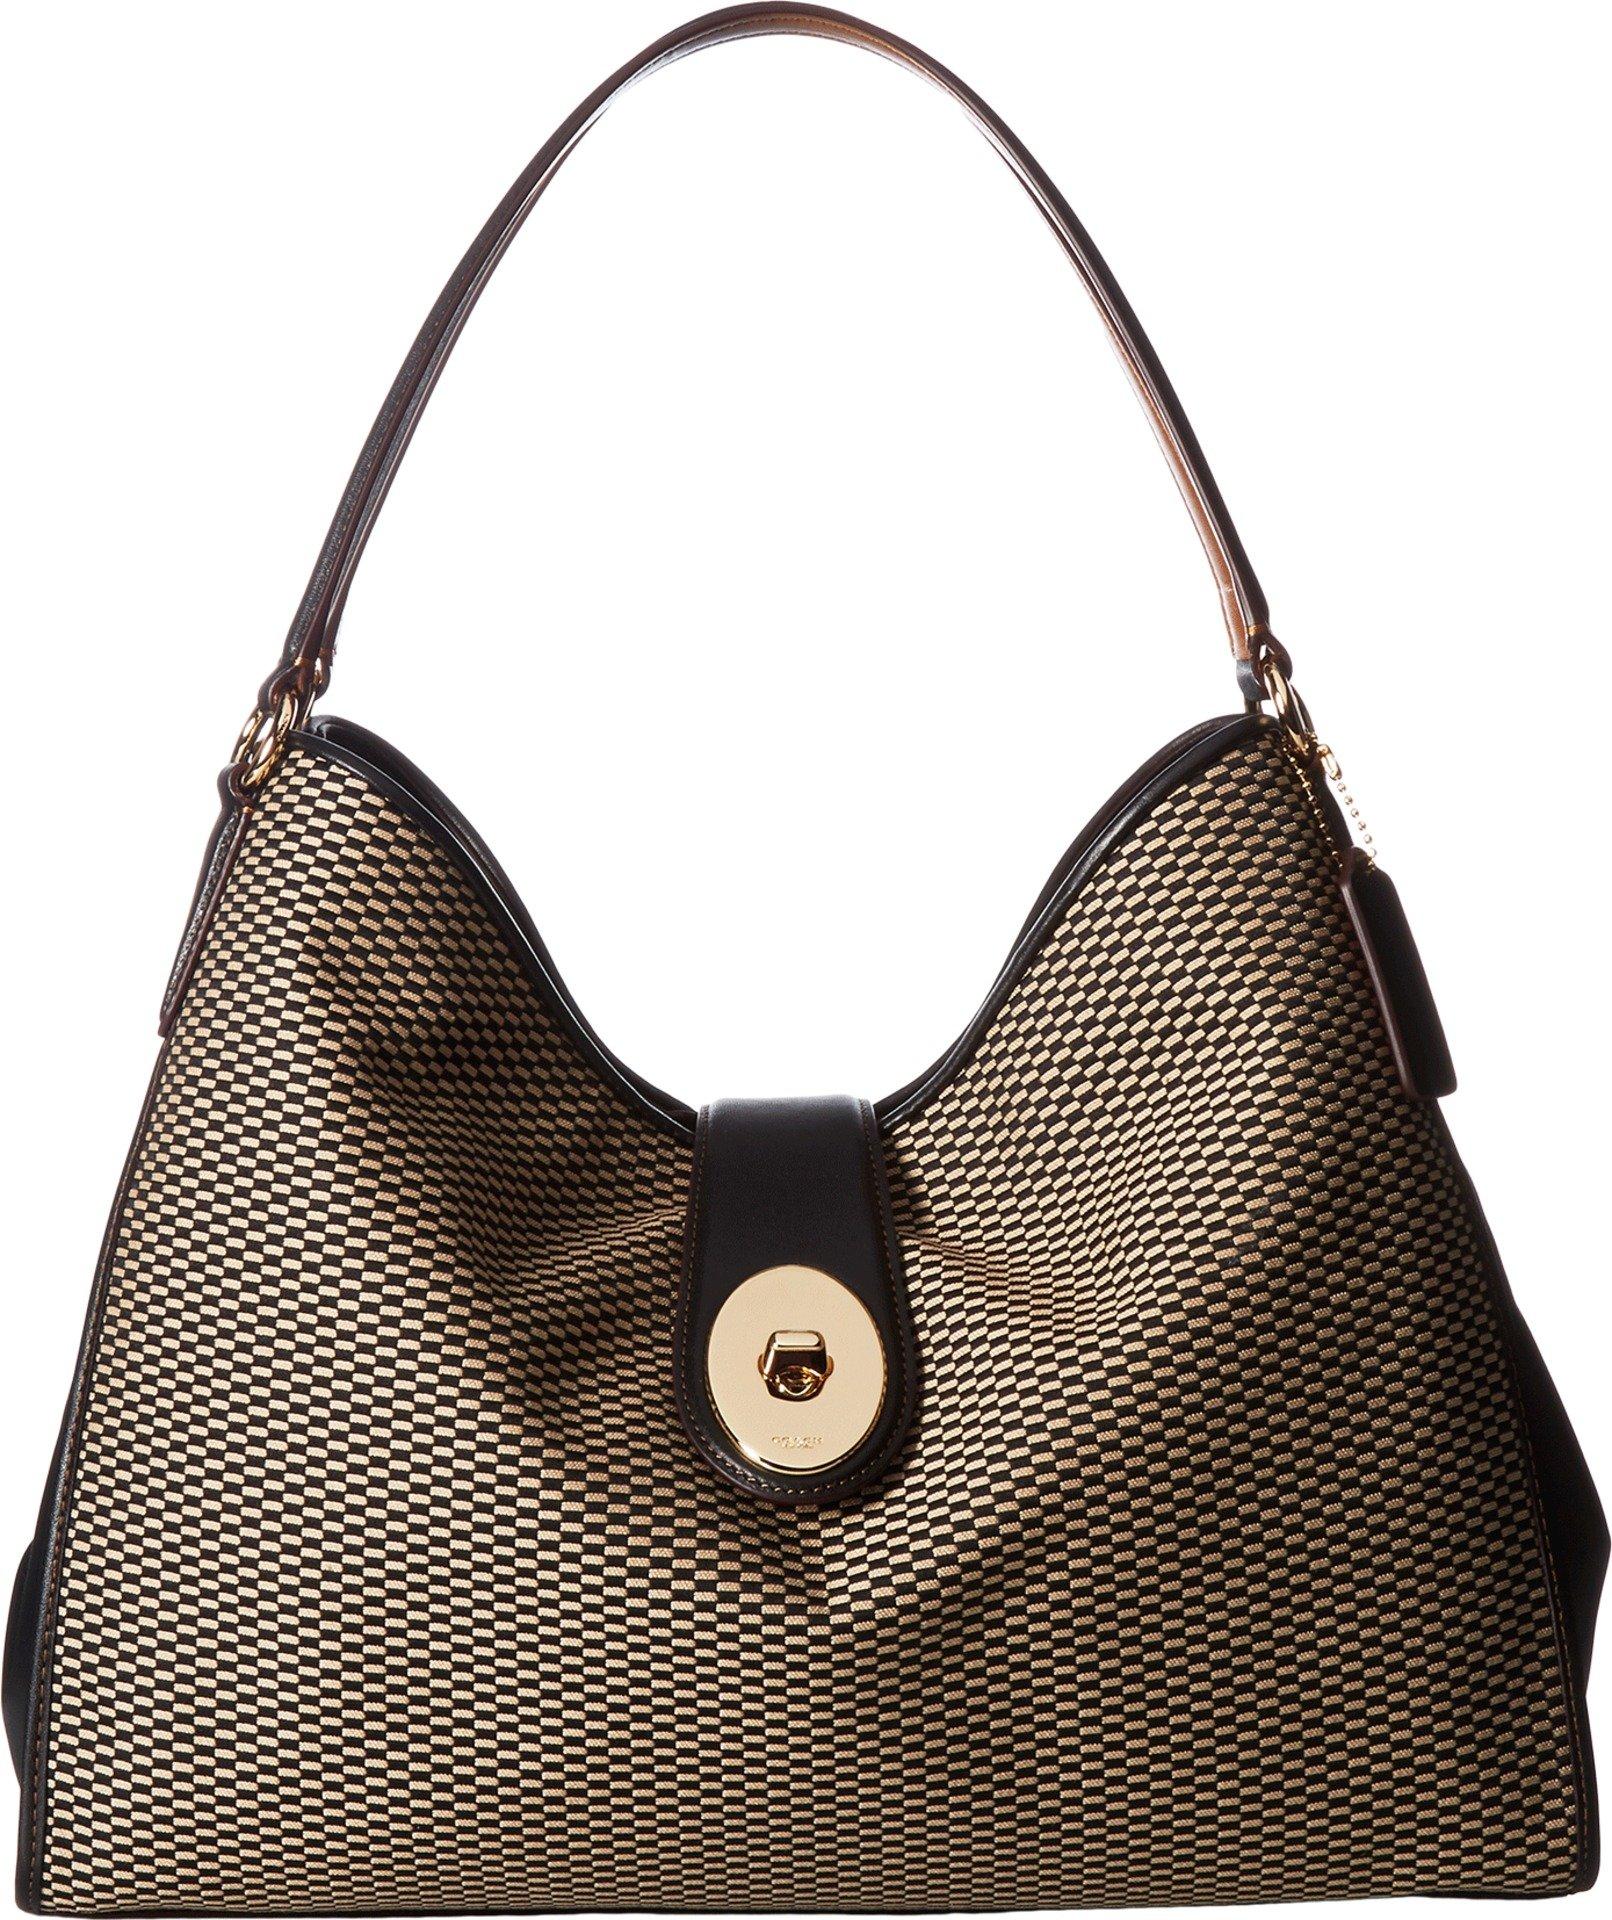 COACH Women's Madison Exploded Reps Carlyle Shoulder Bag Milk/Black Handbag